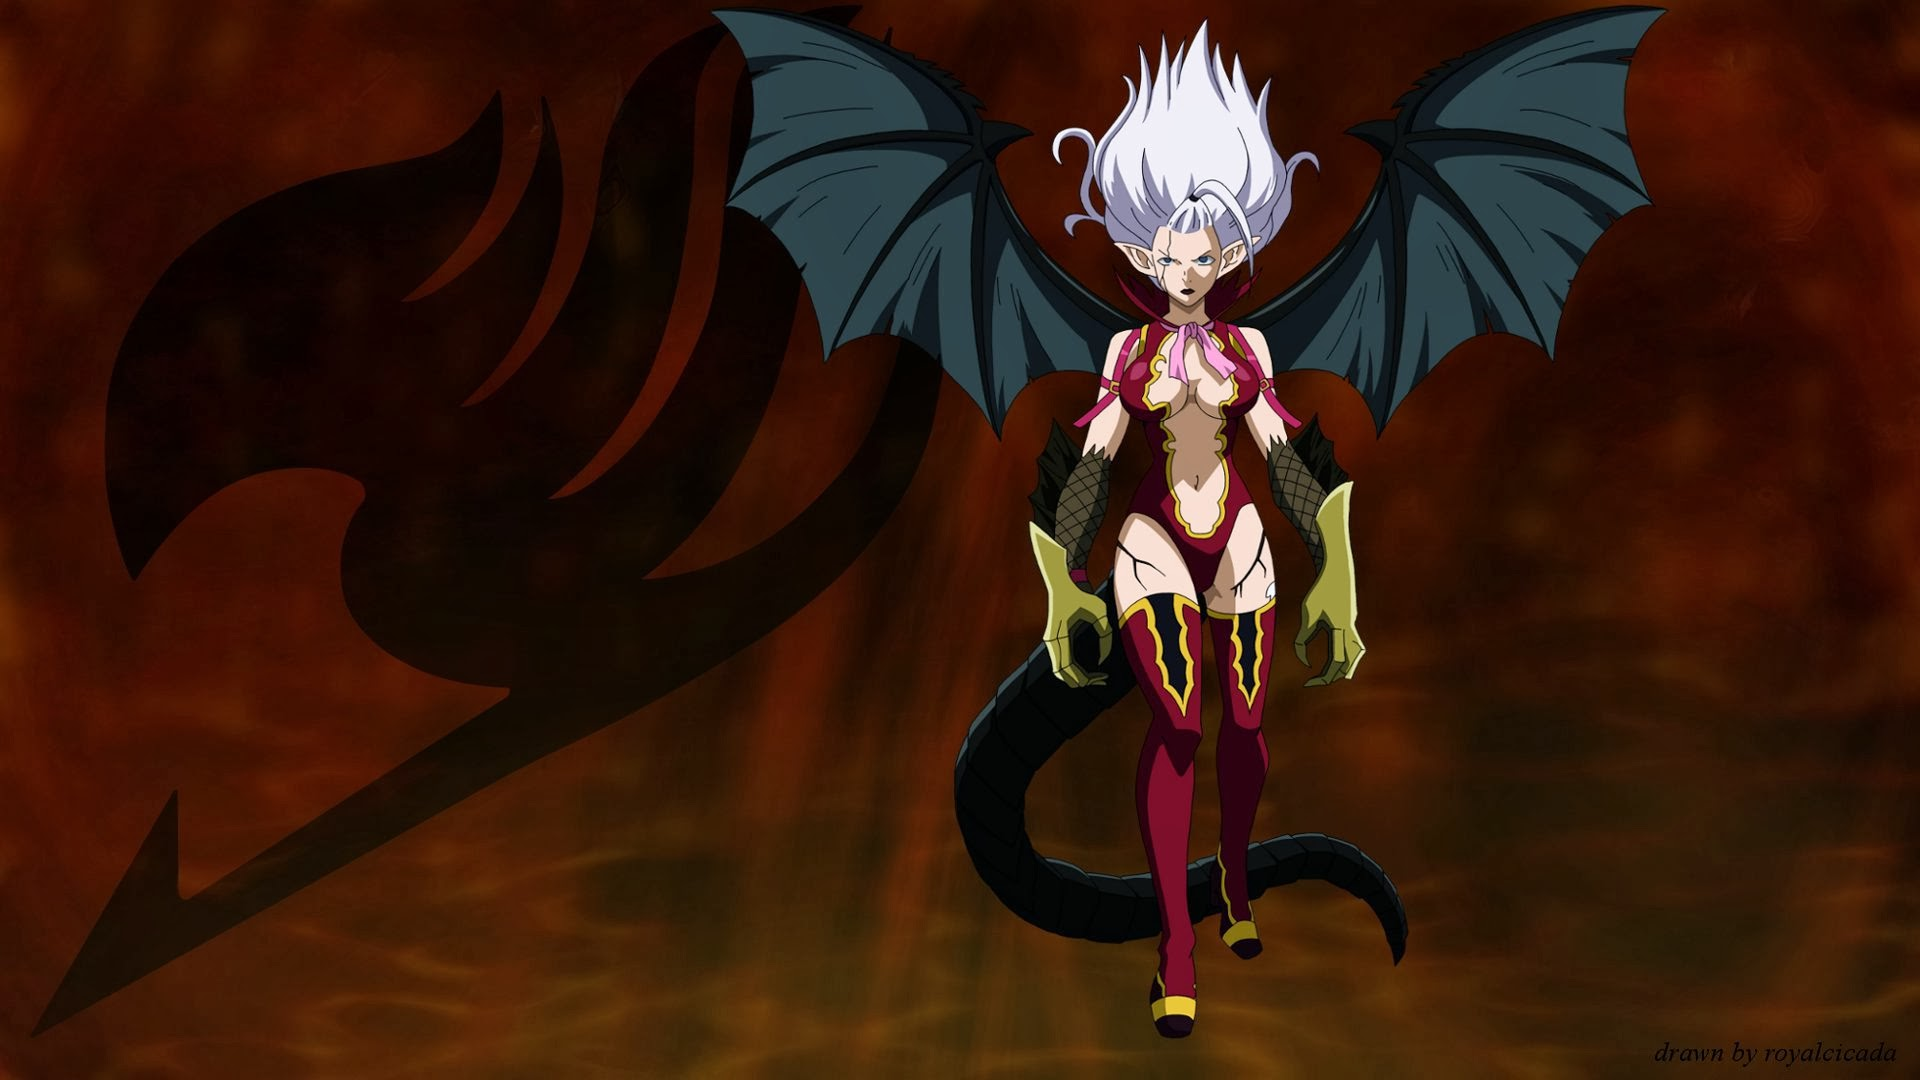 mirajane strauss satan soul wallpaper hd fairy tail anime demon girl 1920x1080